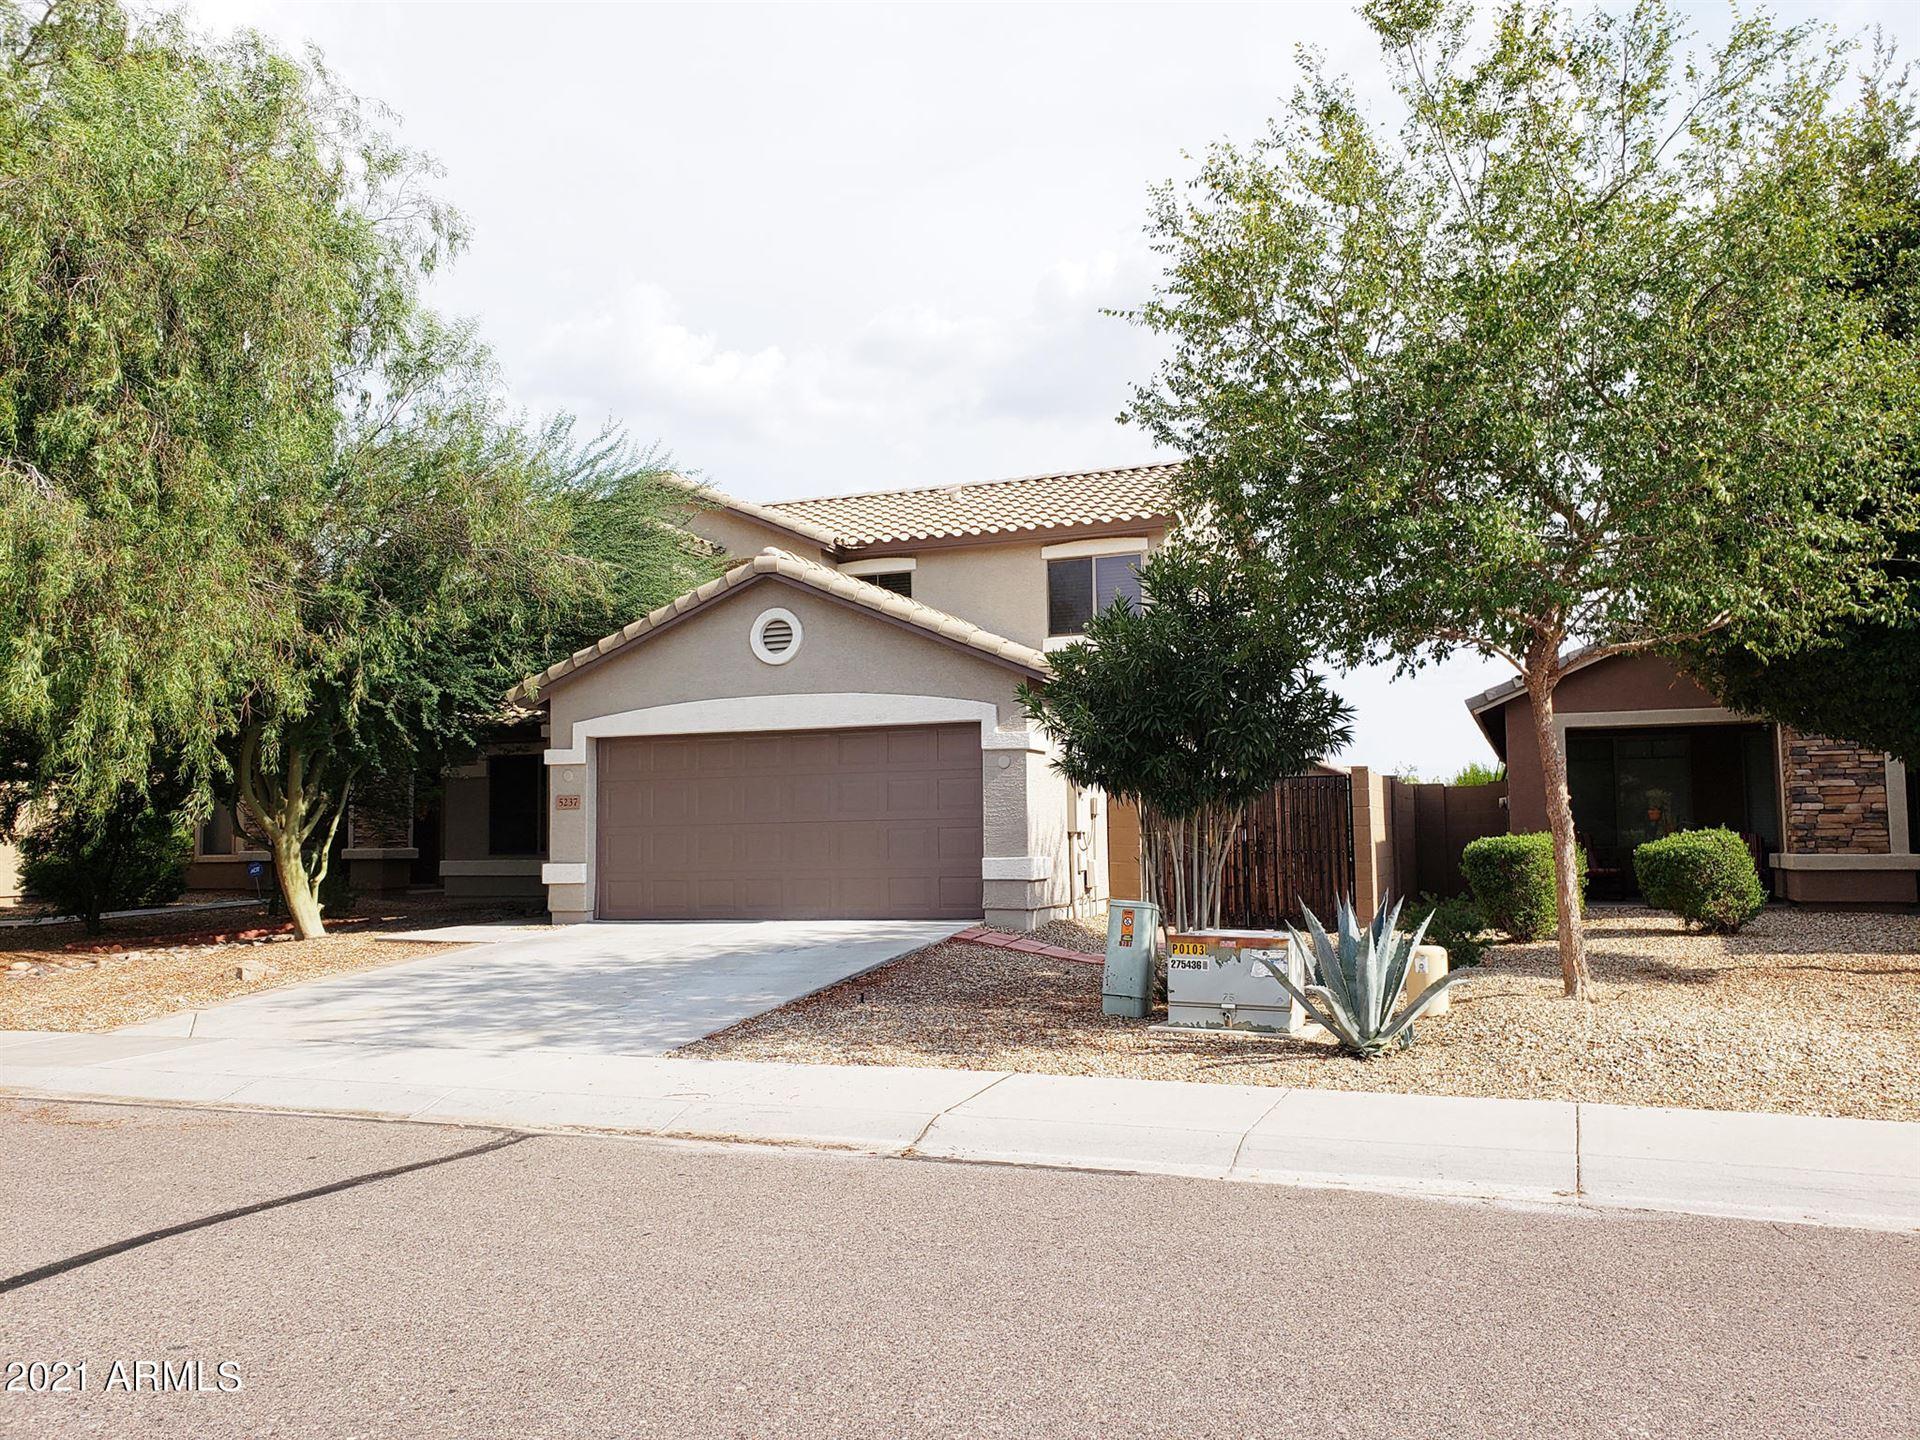 5237 W PLEASANT Lane, Laveen, AZ 85339 - MLS#: 6267987